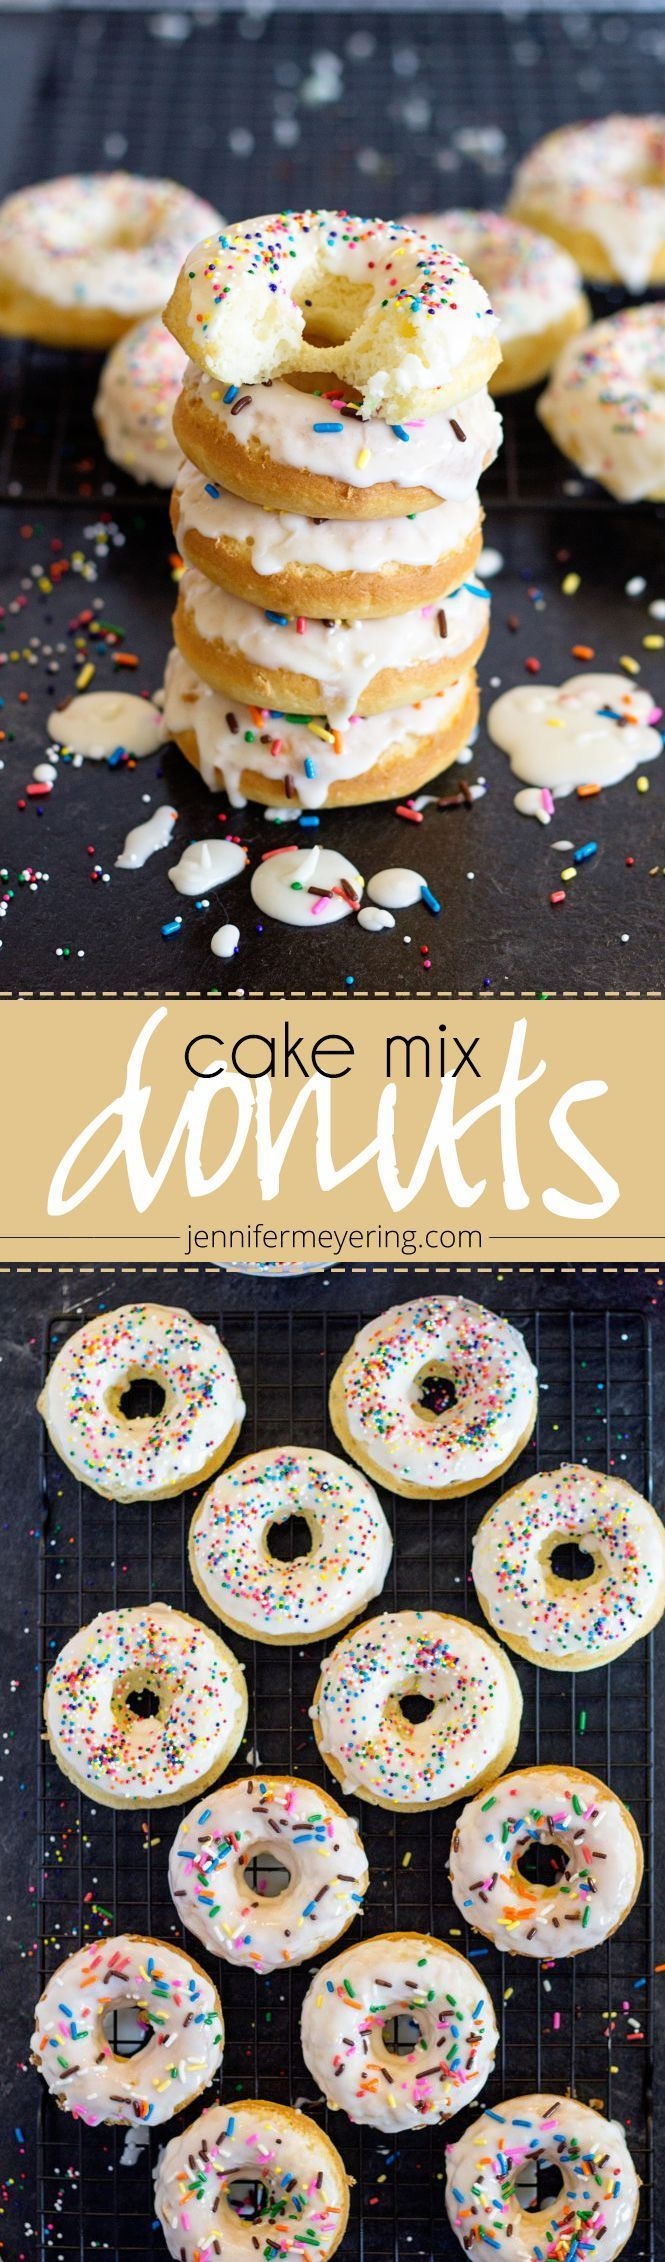 Cake Mix Donuts   JenniferMeyering.com